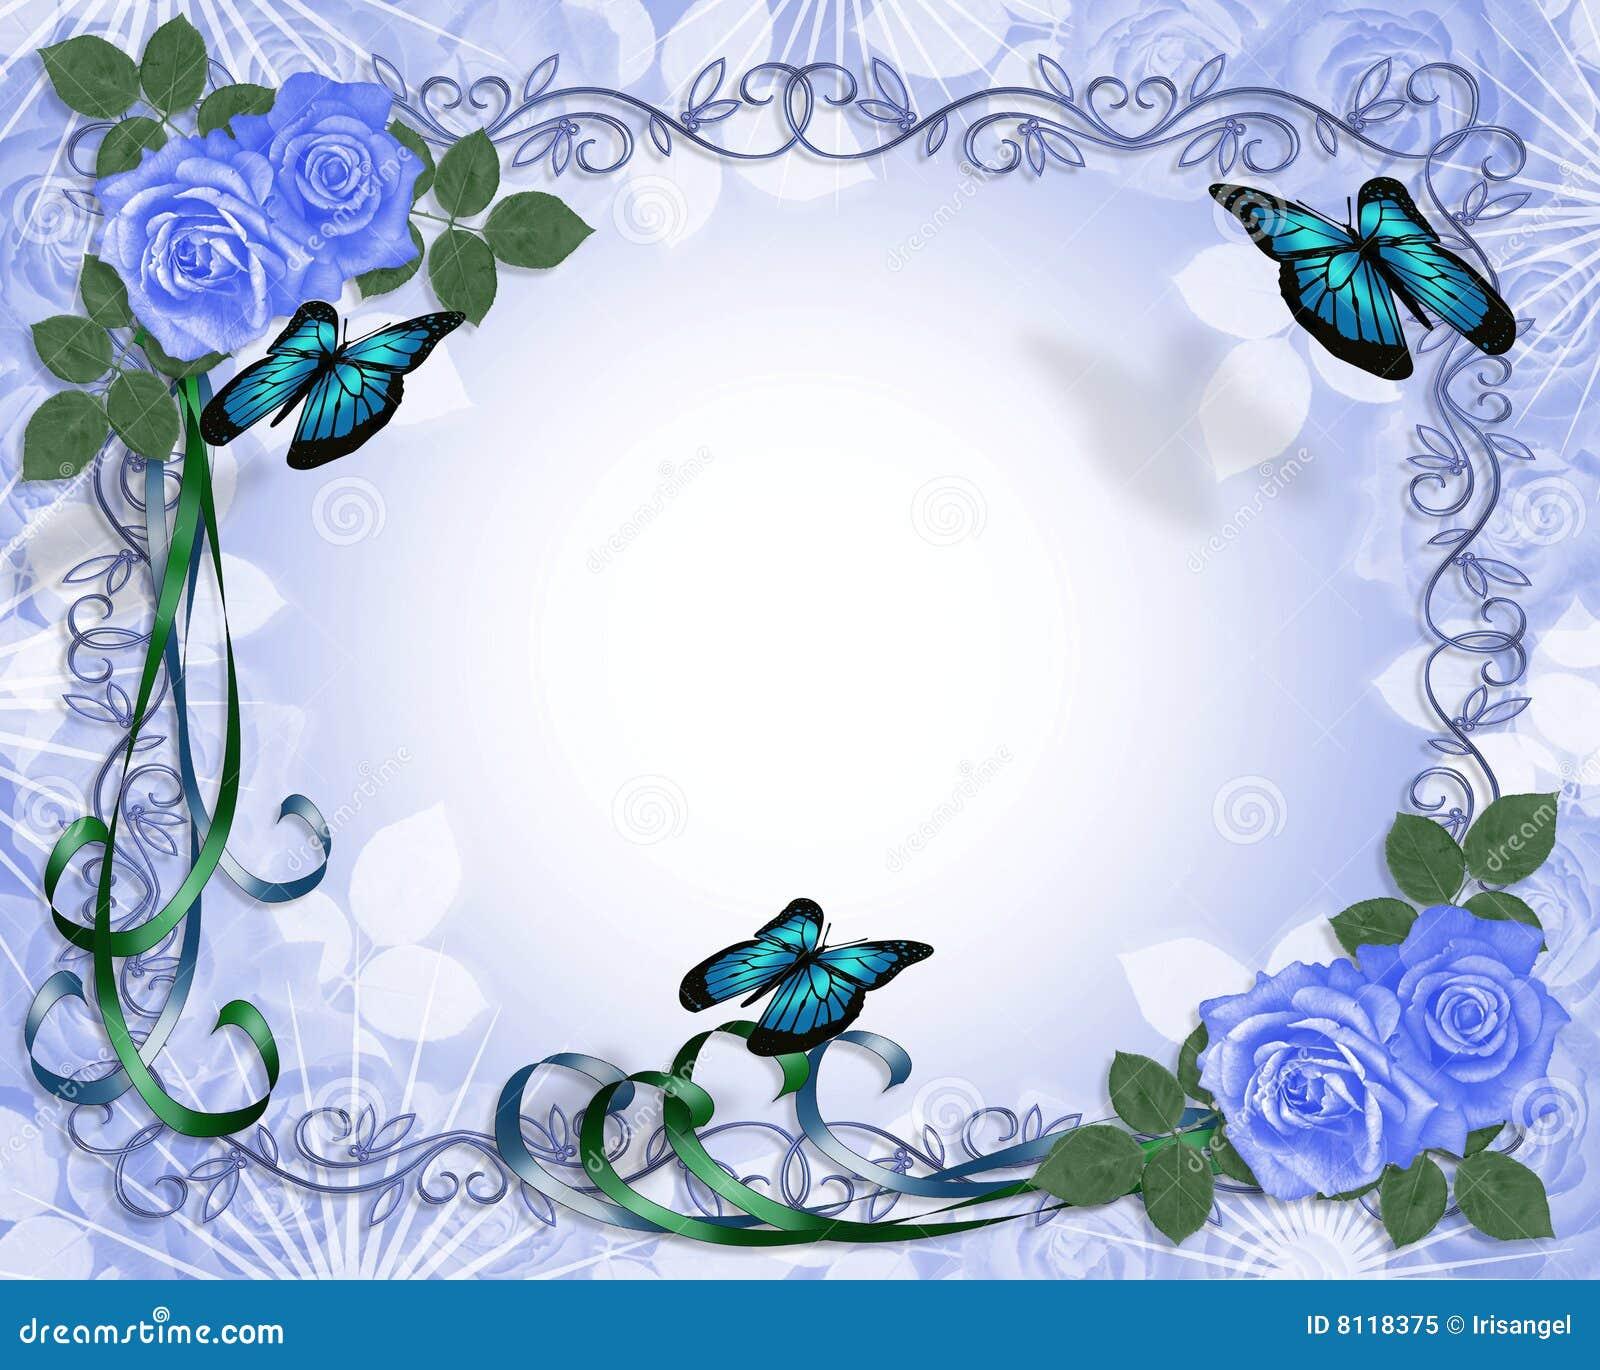 Blue Rose Border Clip Art